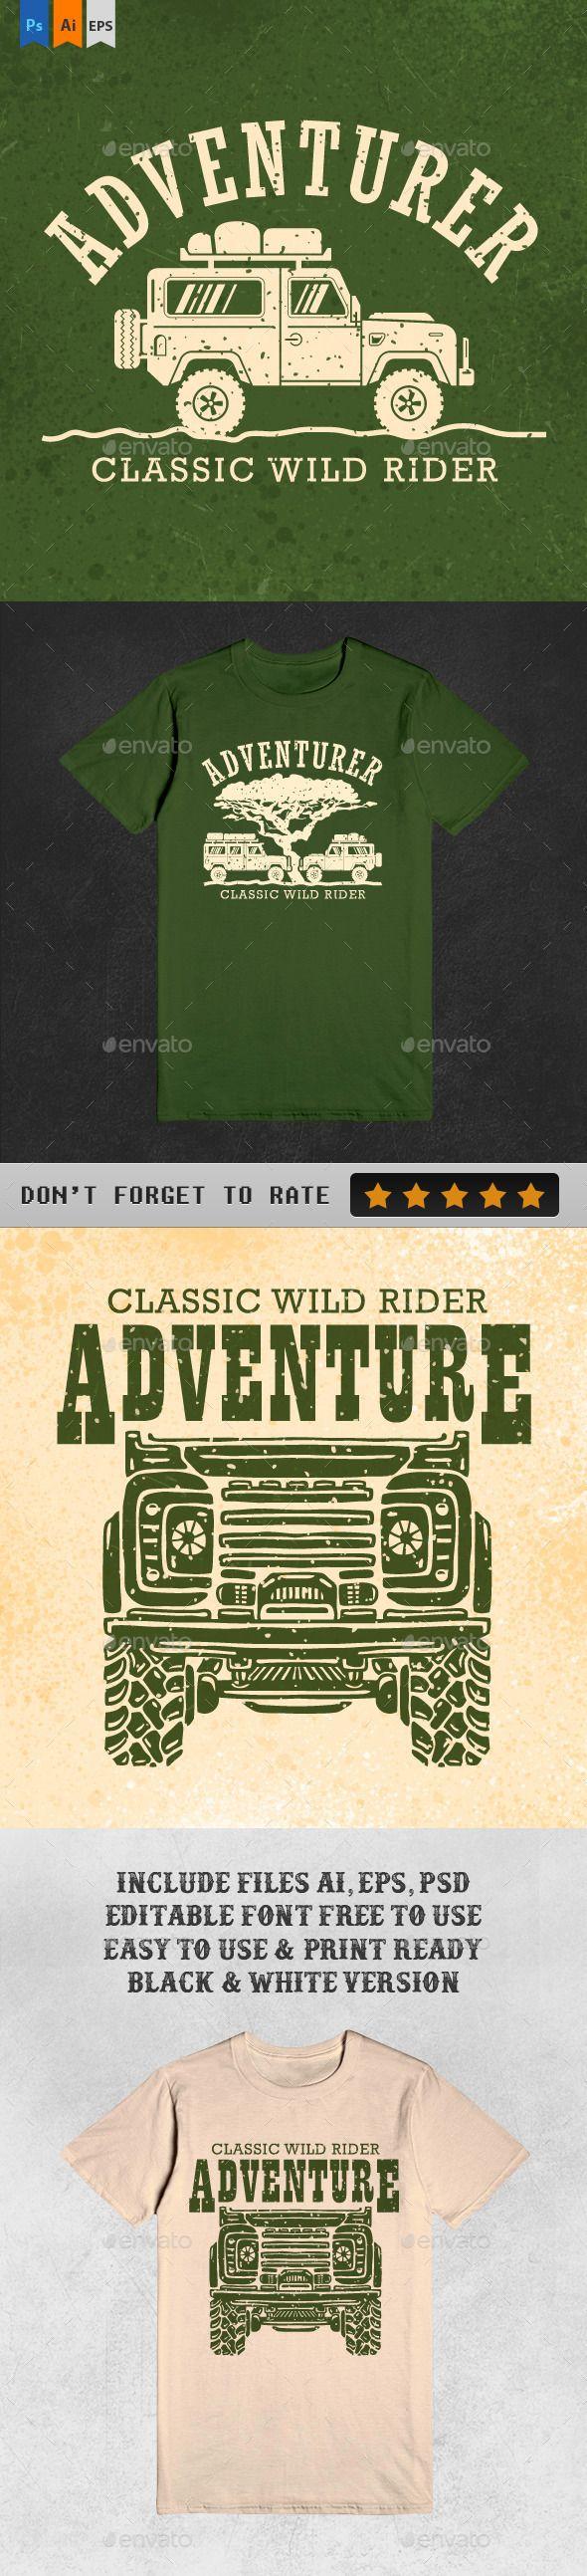 T-shirt design kit free download full - 3 Ultimate Adventure Tshirt